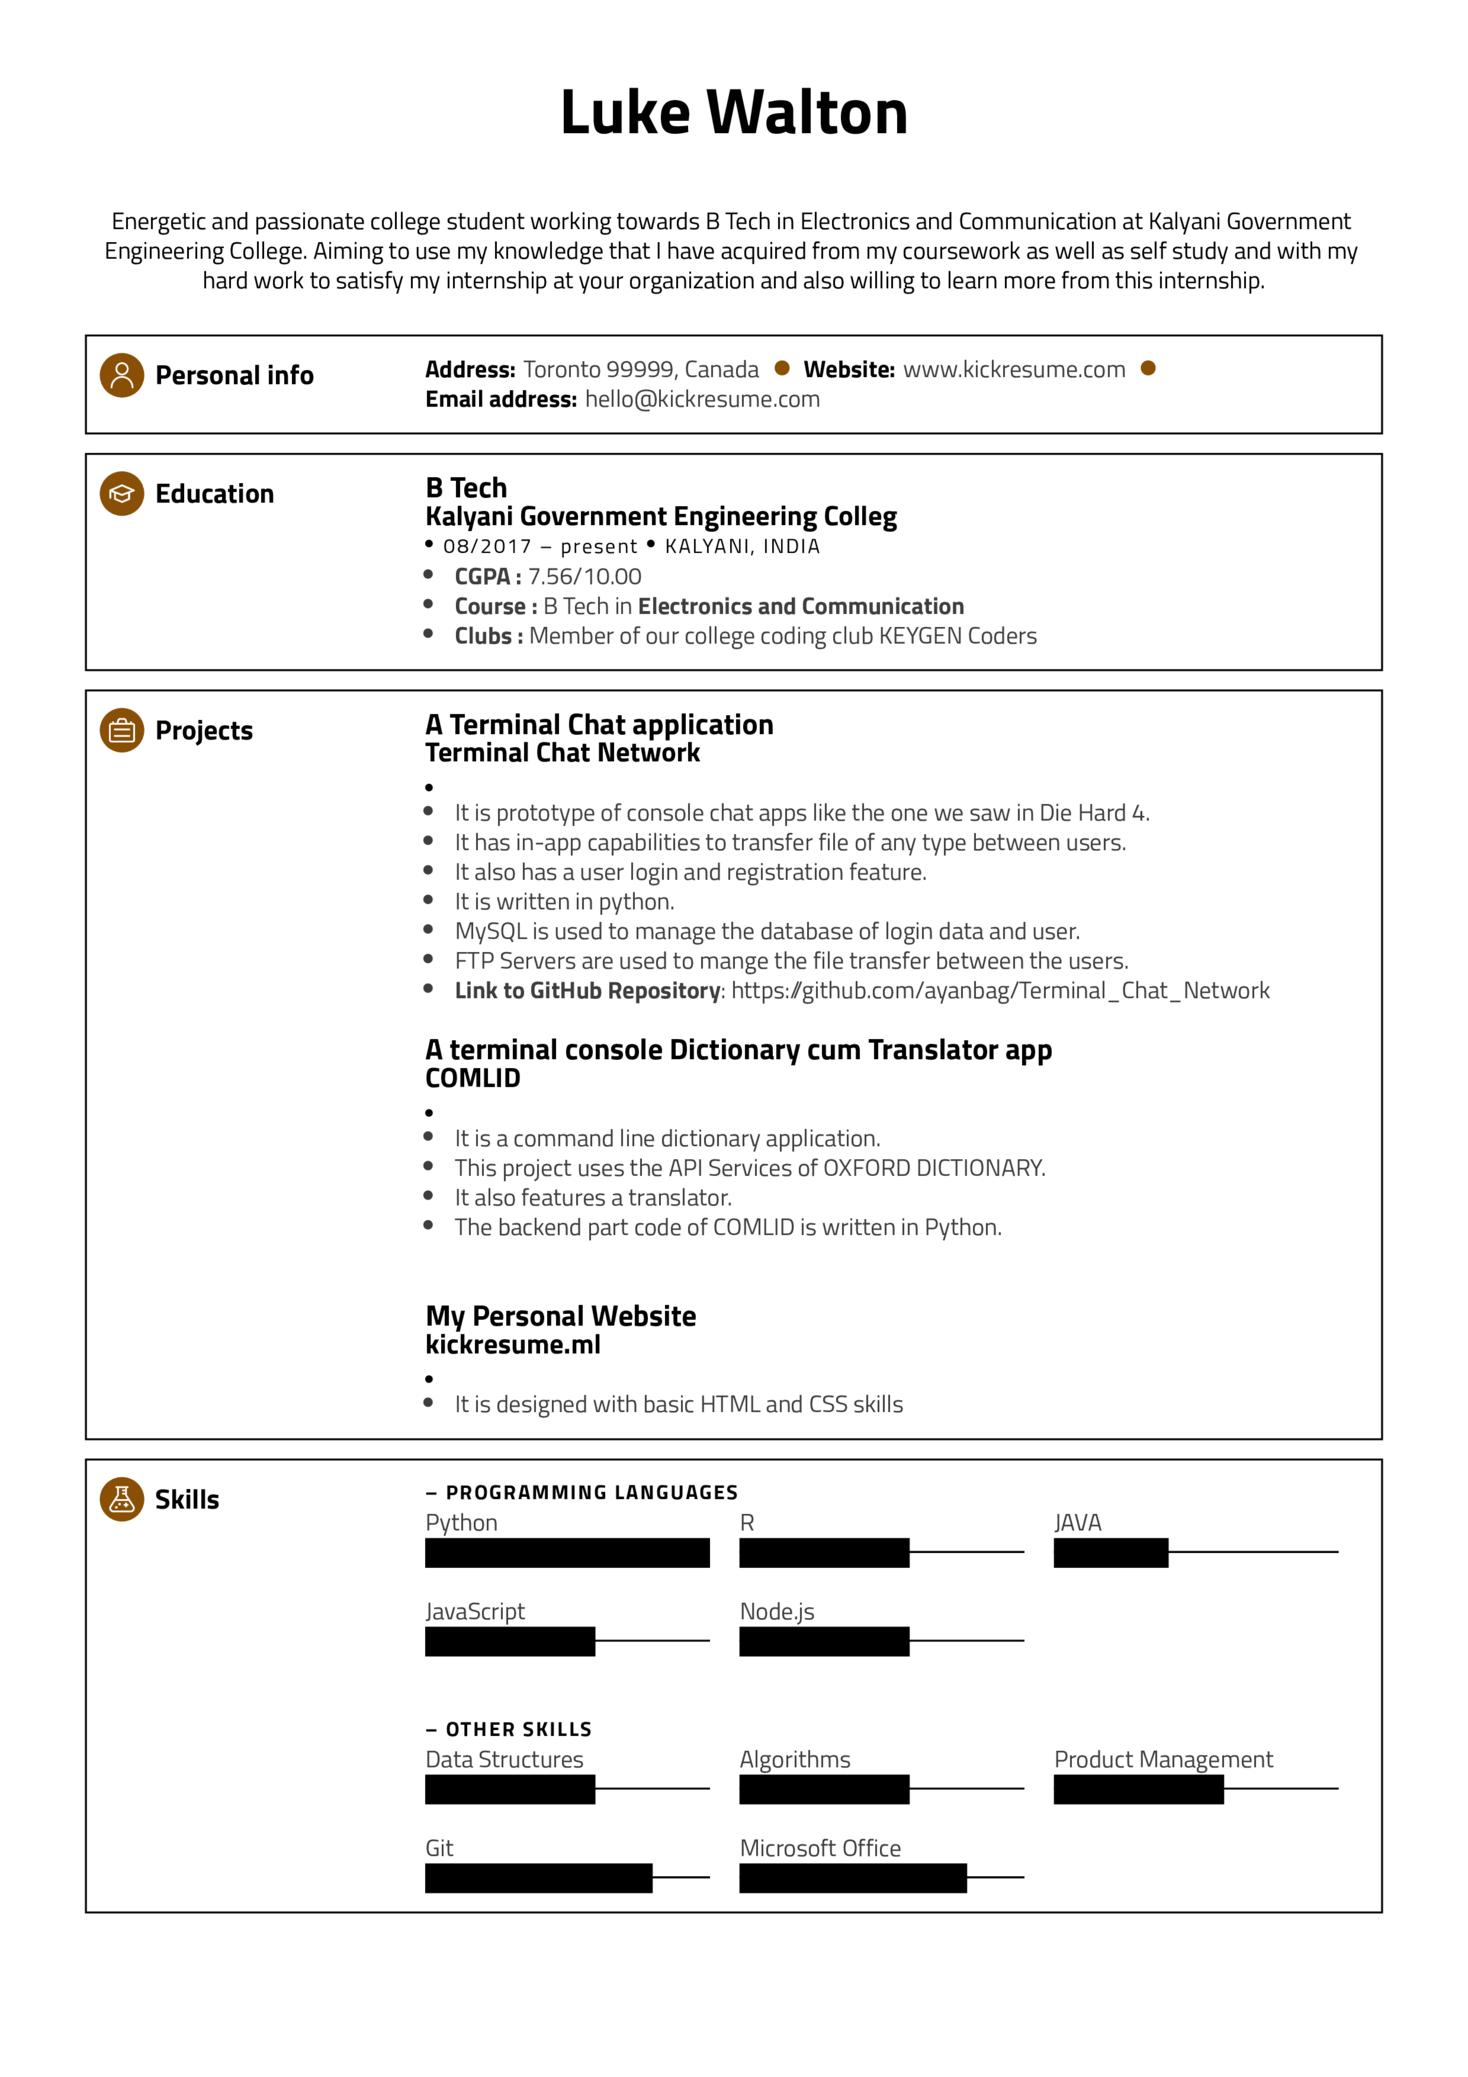 Google Software Engineering Intern Resume Sample (Teil 1)